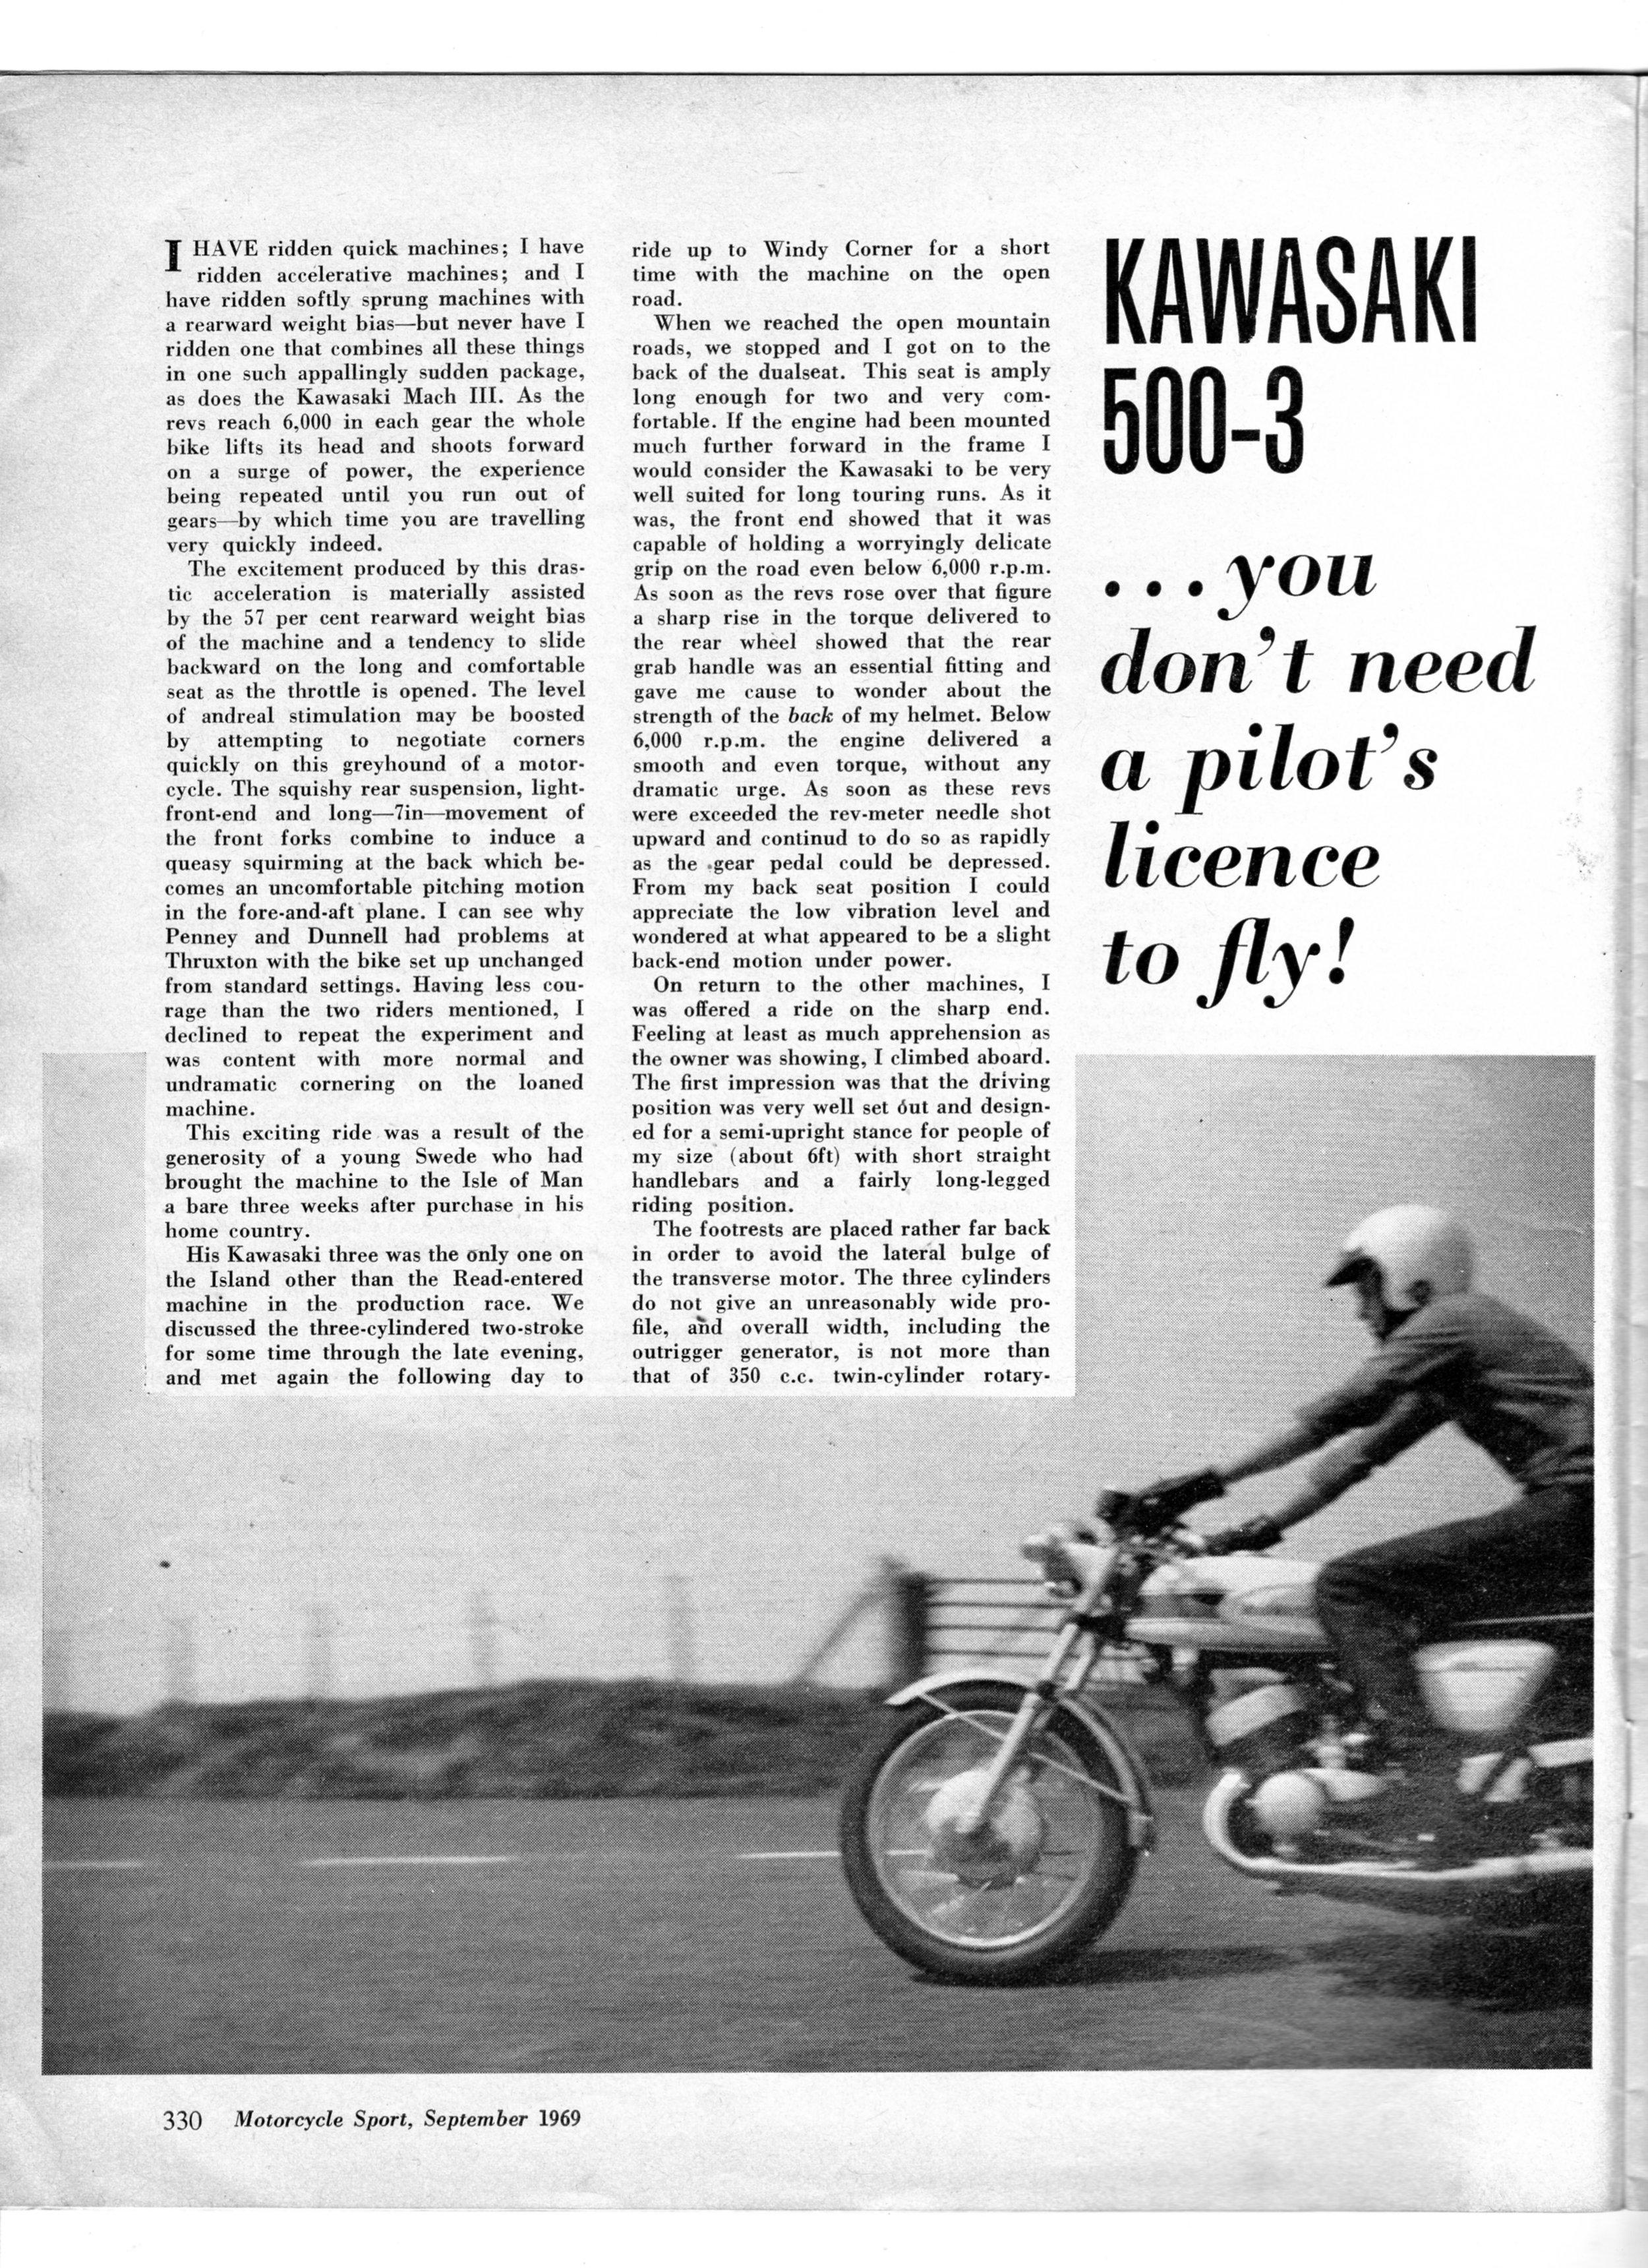 1969 Kawasaki 500-3 road test 1.jpg